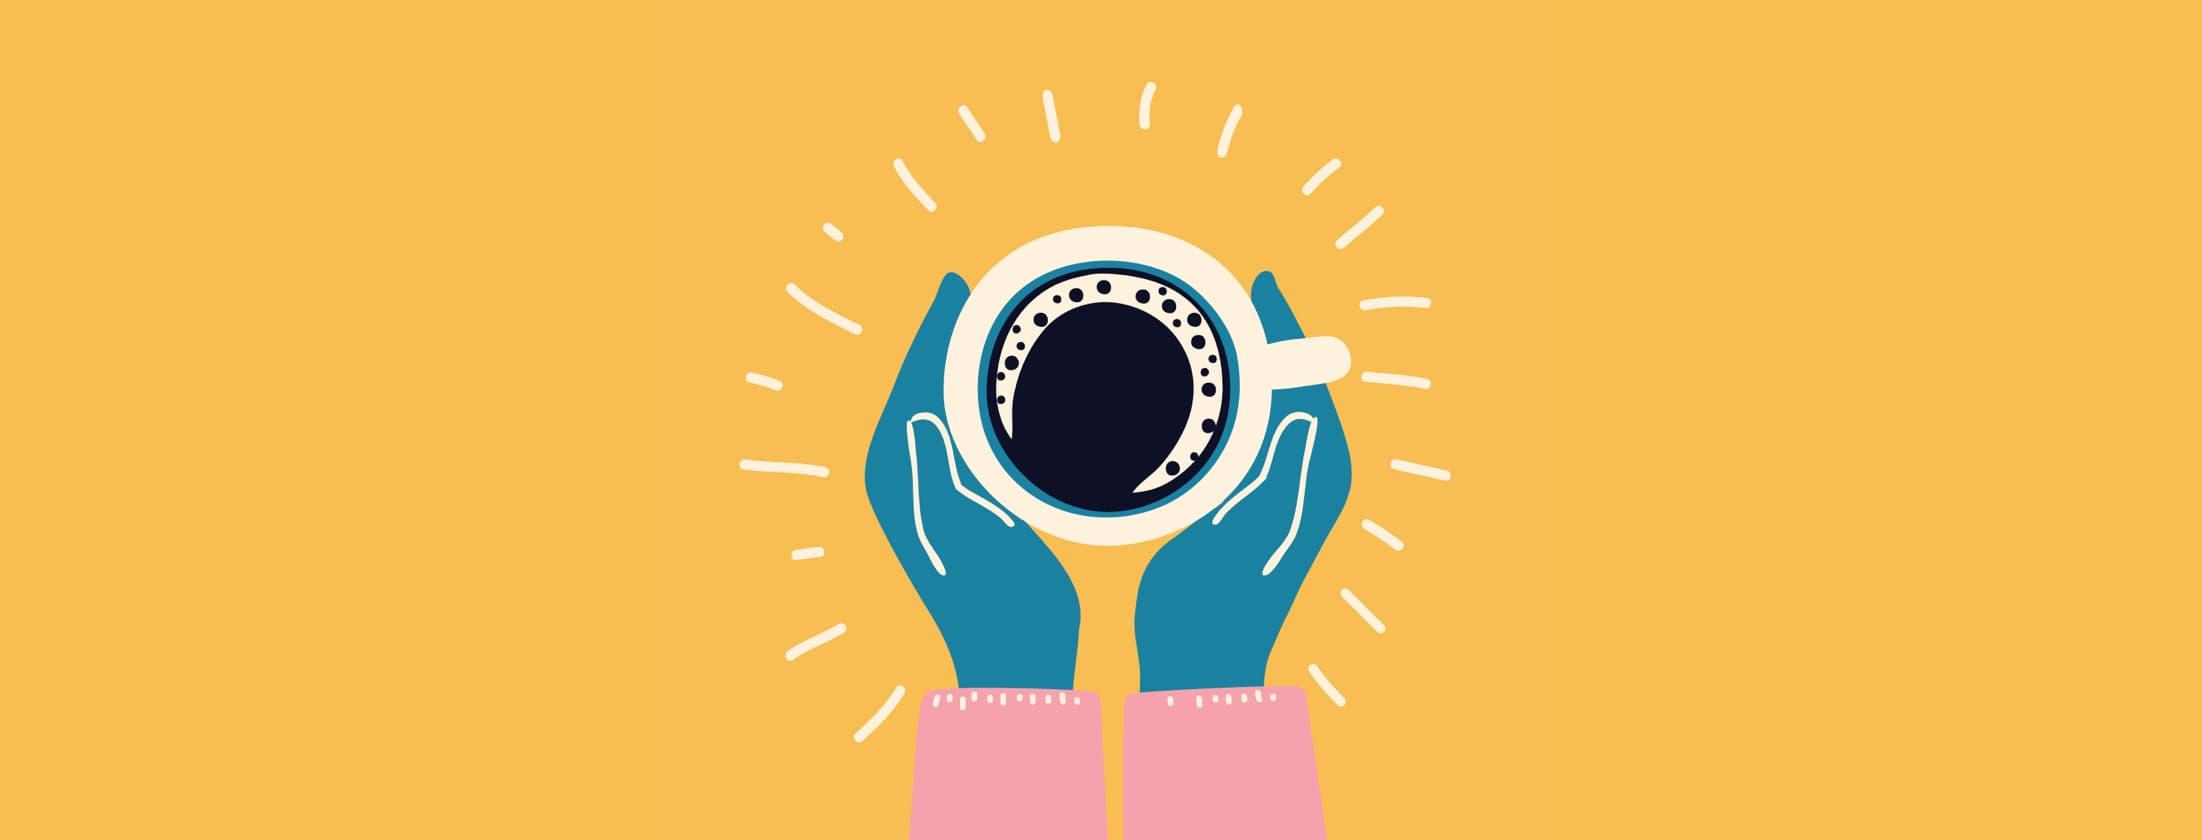 caffeine: trigger or treatment?   migraine